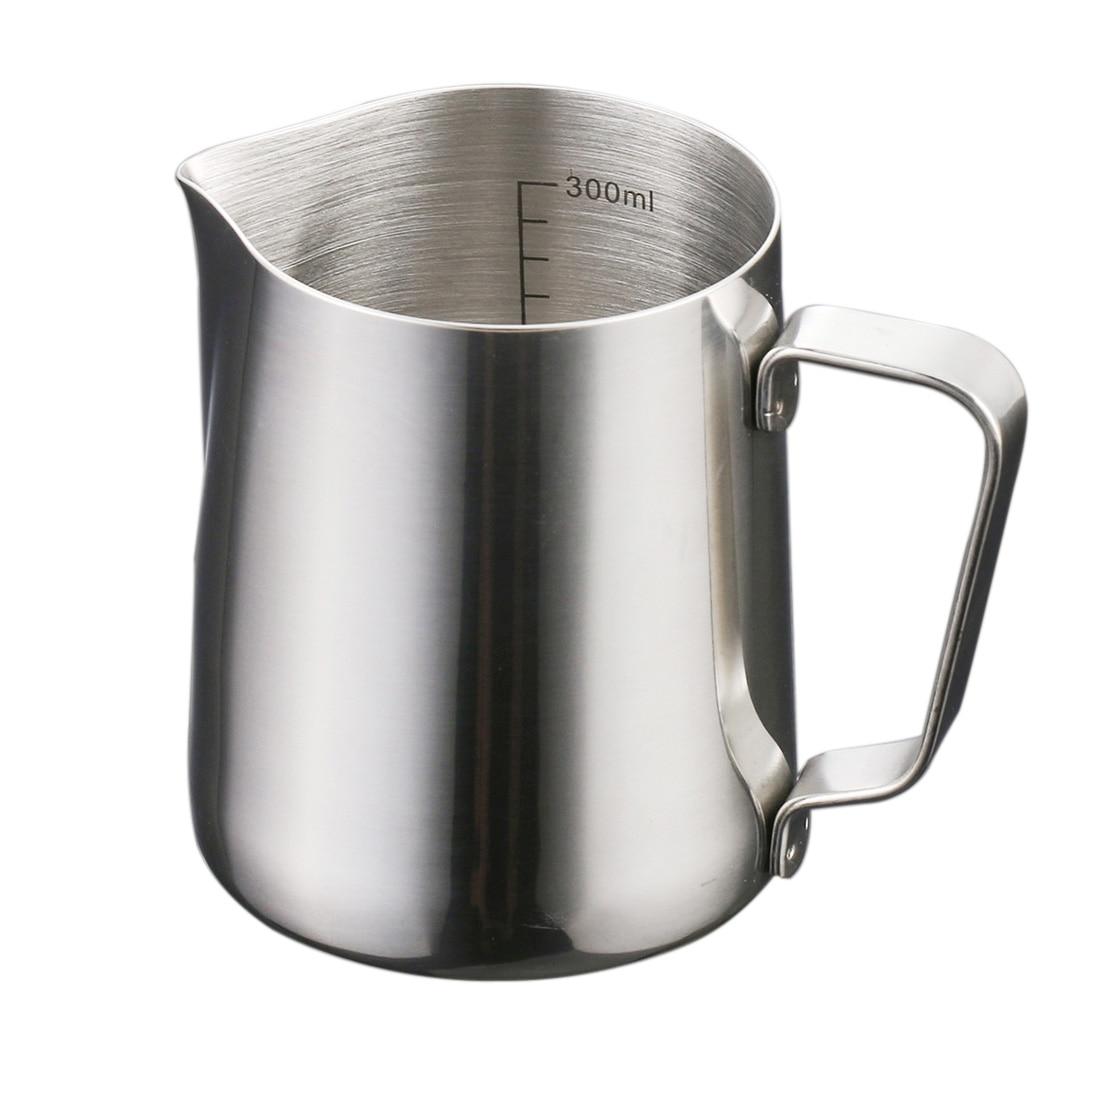 300ml Milk Jug Metal Stainless Steel Garland Coffee Cup Fancy Italian Espresso Latte Art Milk Frothing Pitcher Steaming Jug Cups